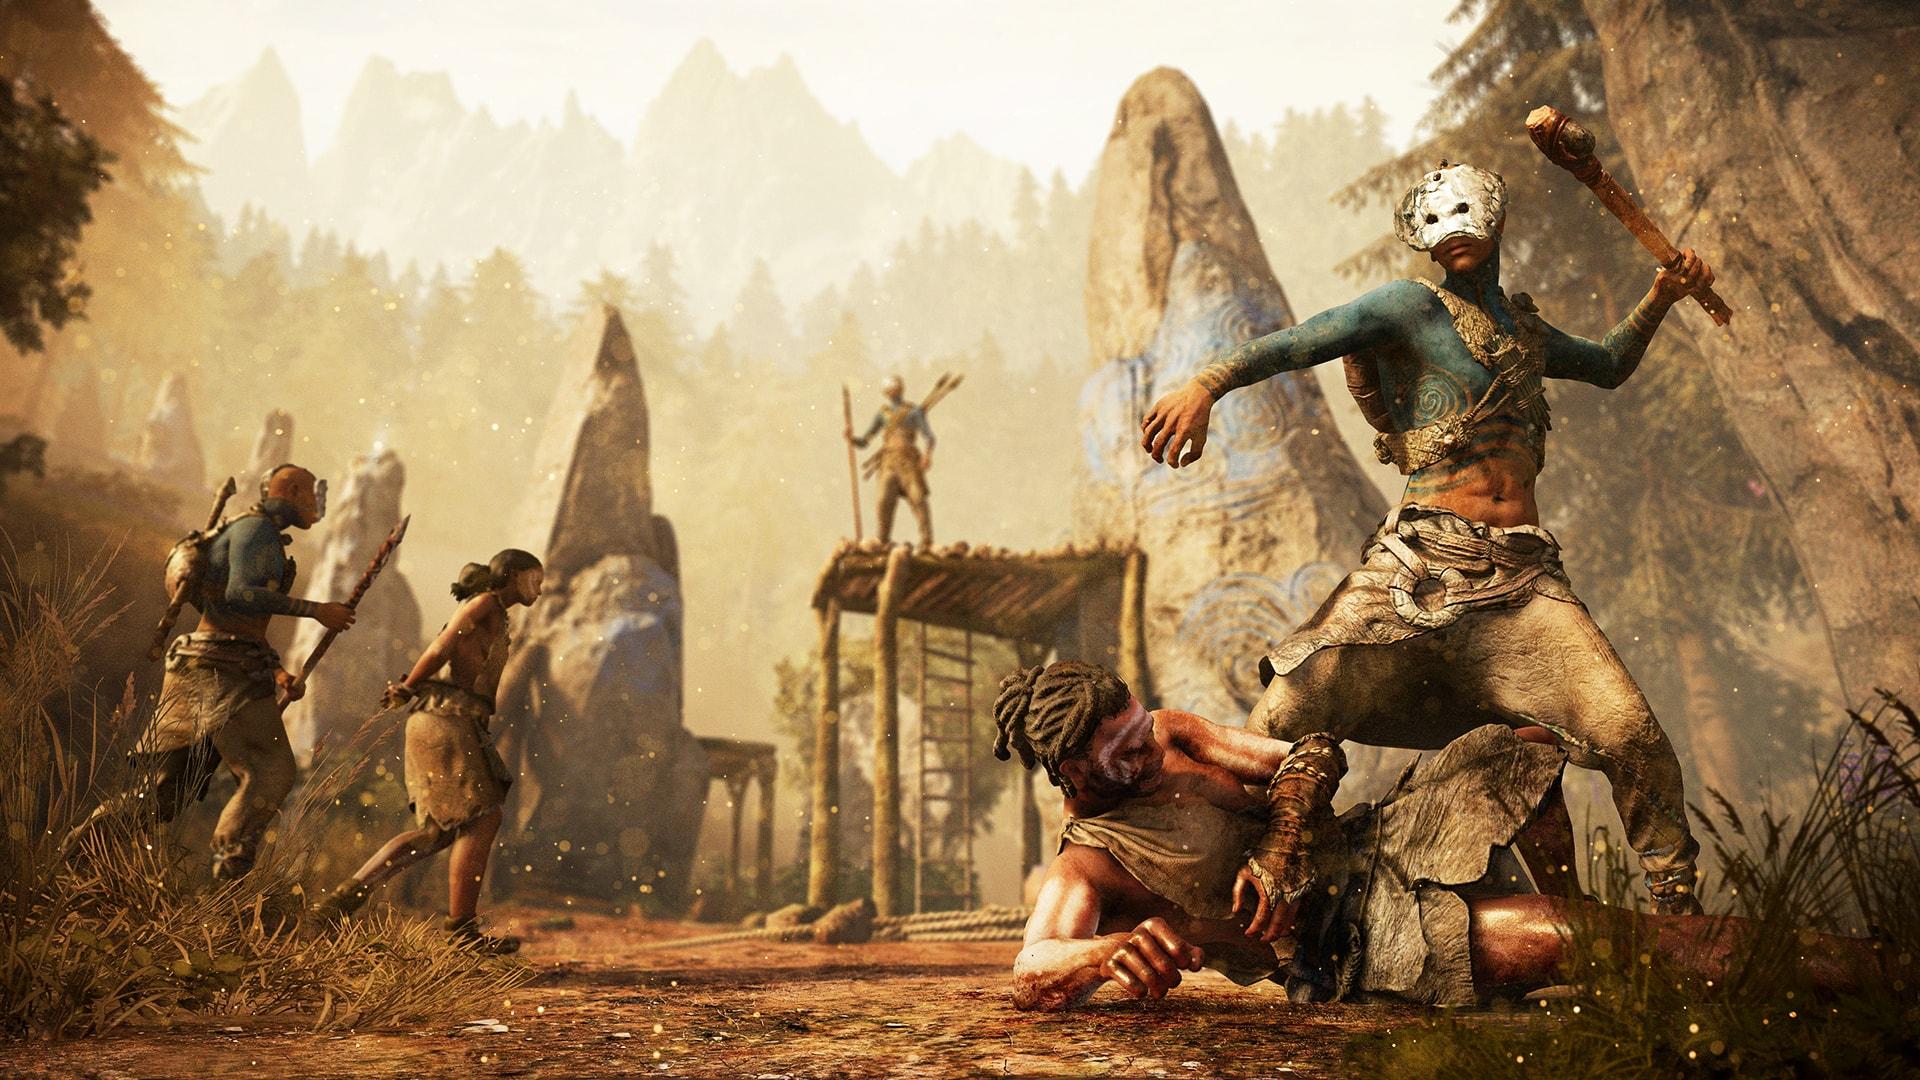 Far Cry Primal Wallpaper